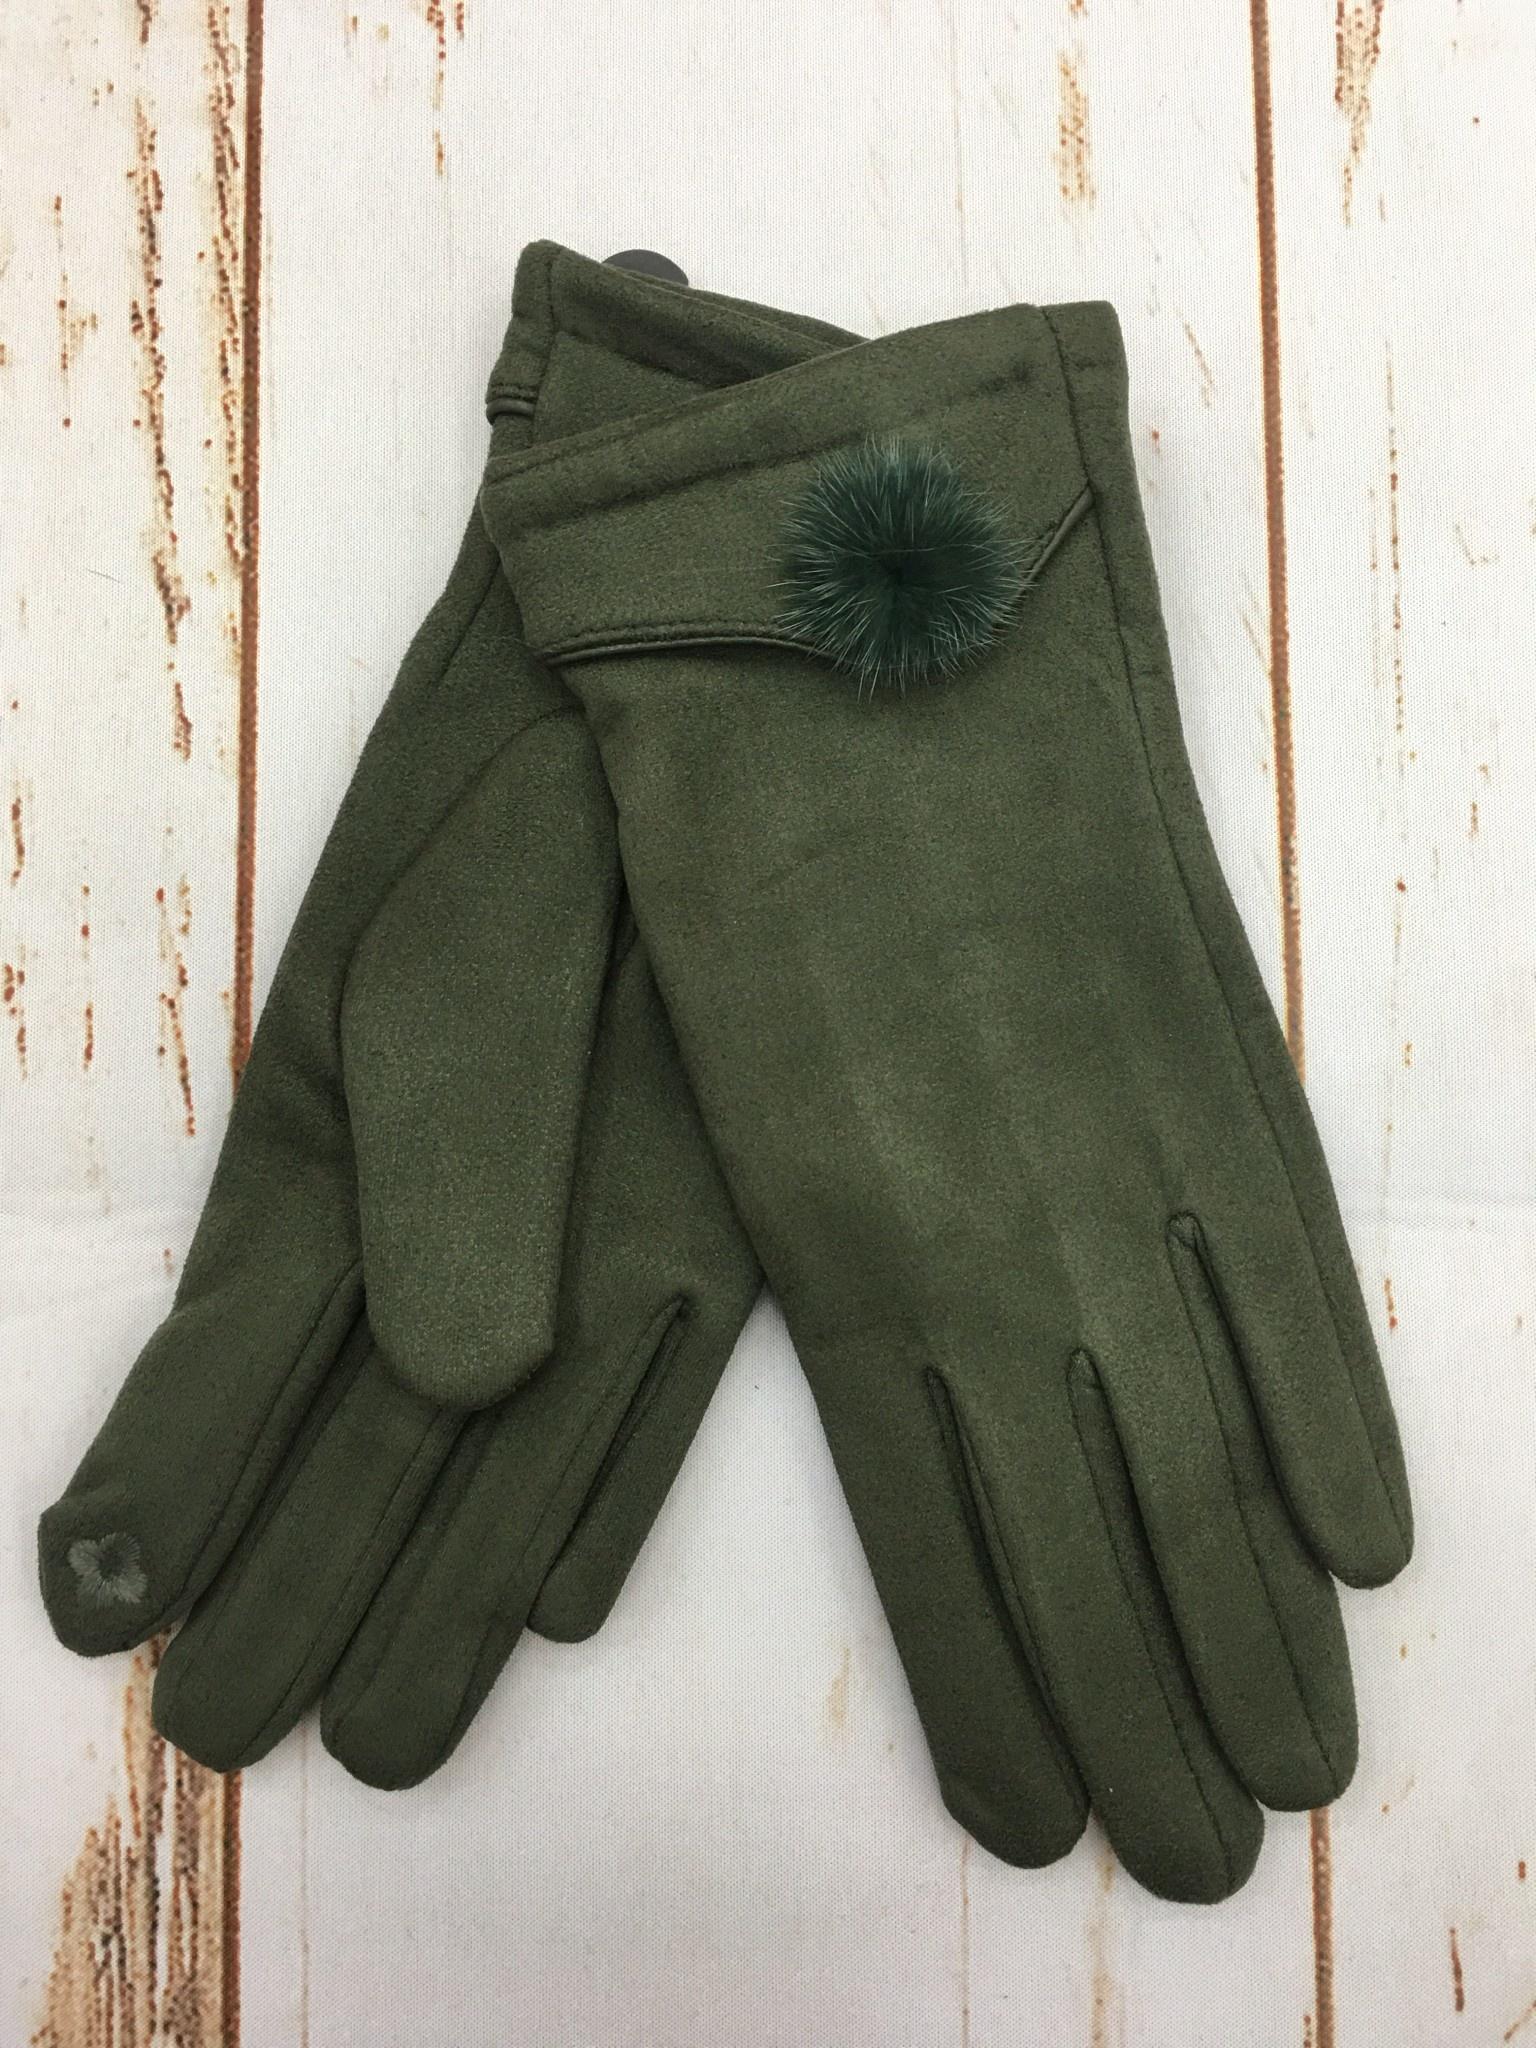 Top It Off Suede Glove W/Pom in Hunter Green